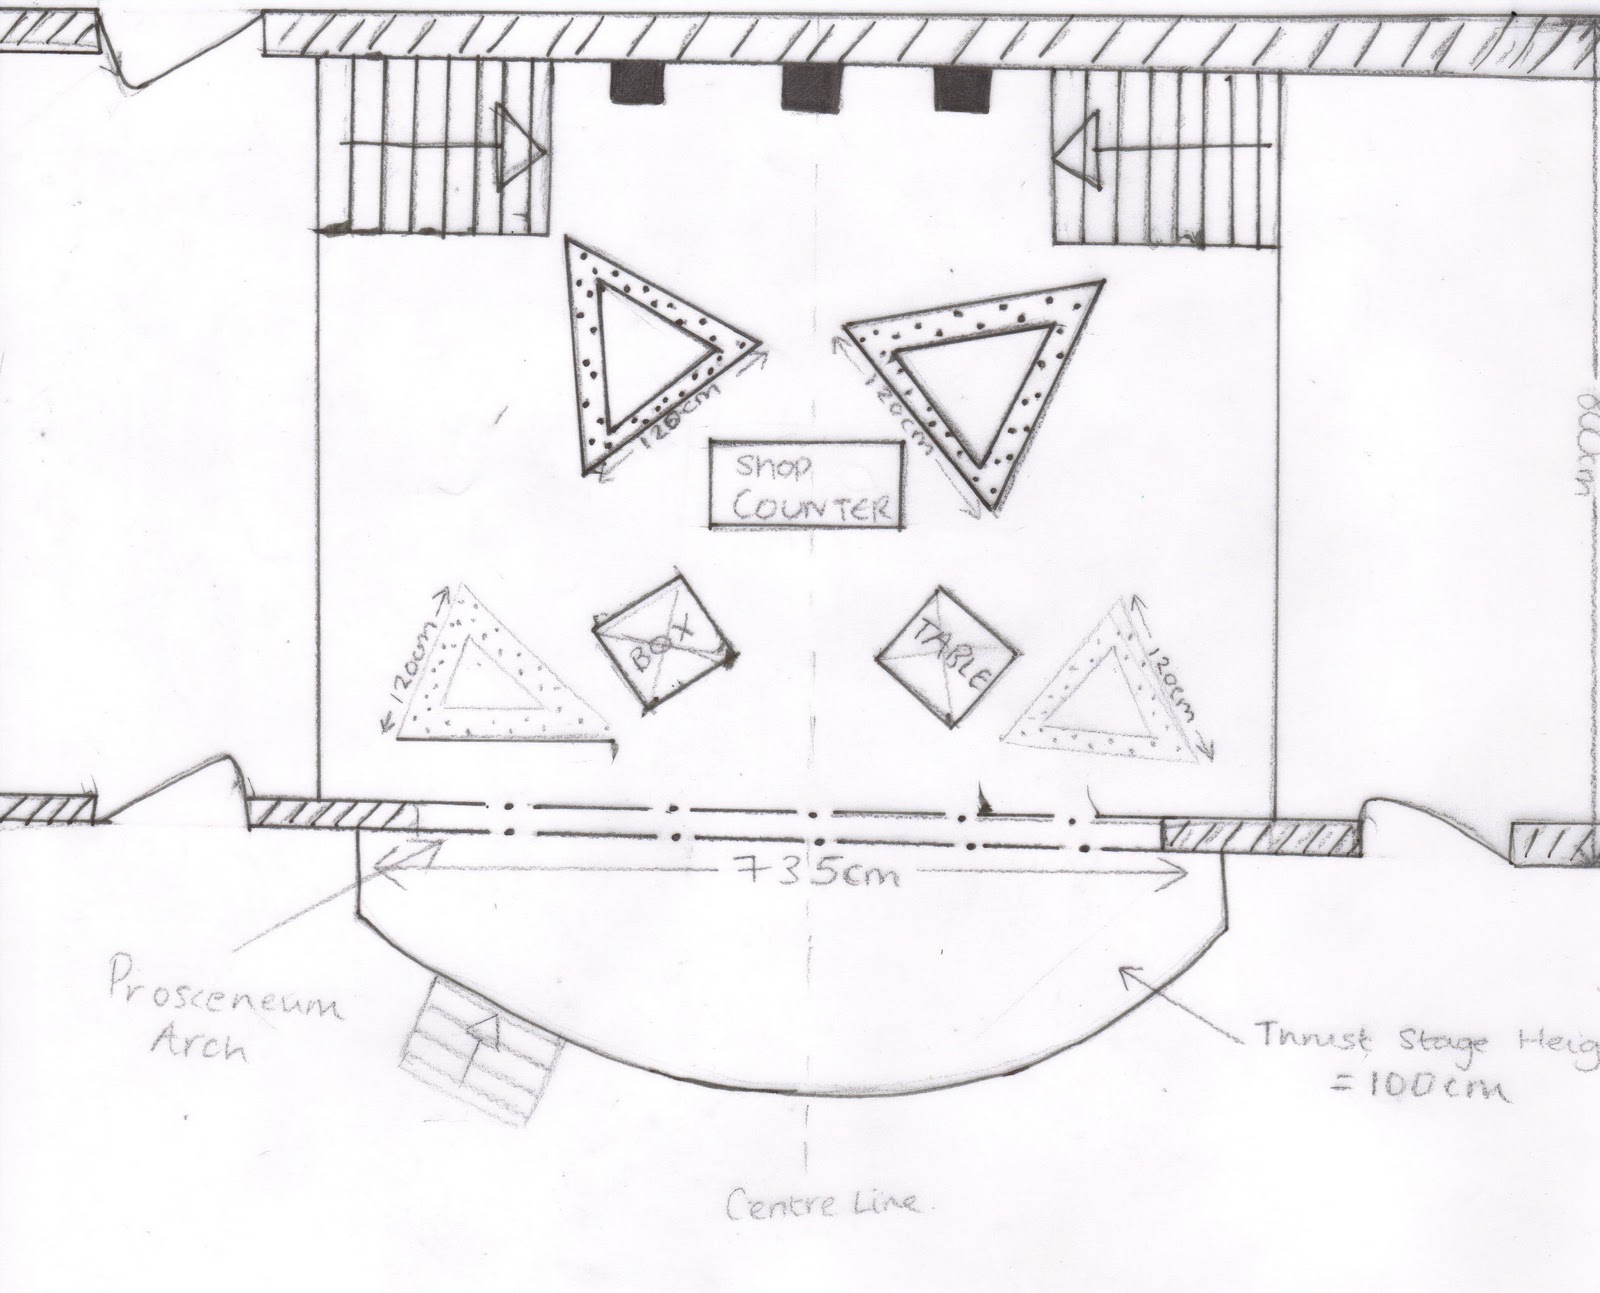 blank theatre stage diagram pioneer deh 1600 wiring design layout related keywords - long tail keywordsking